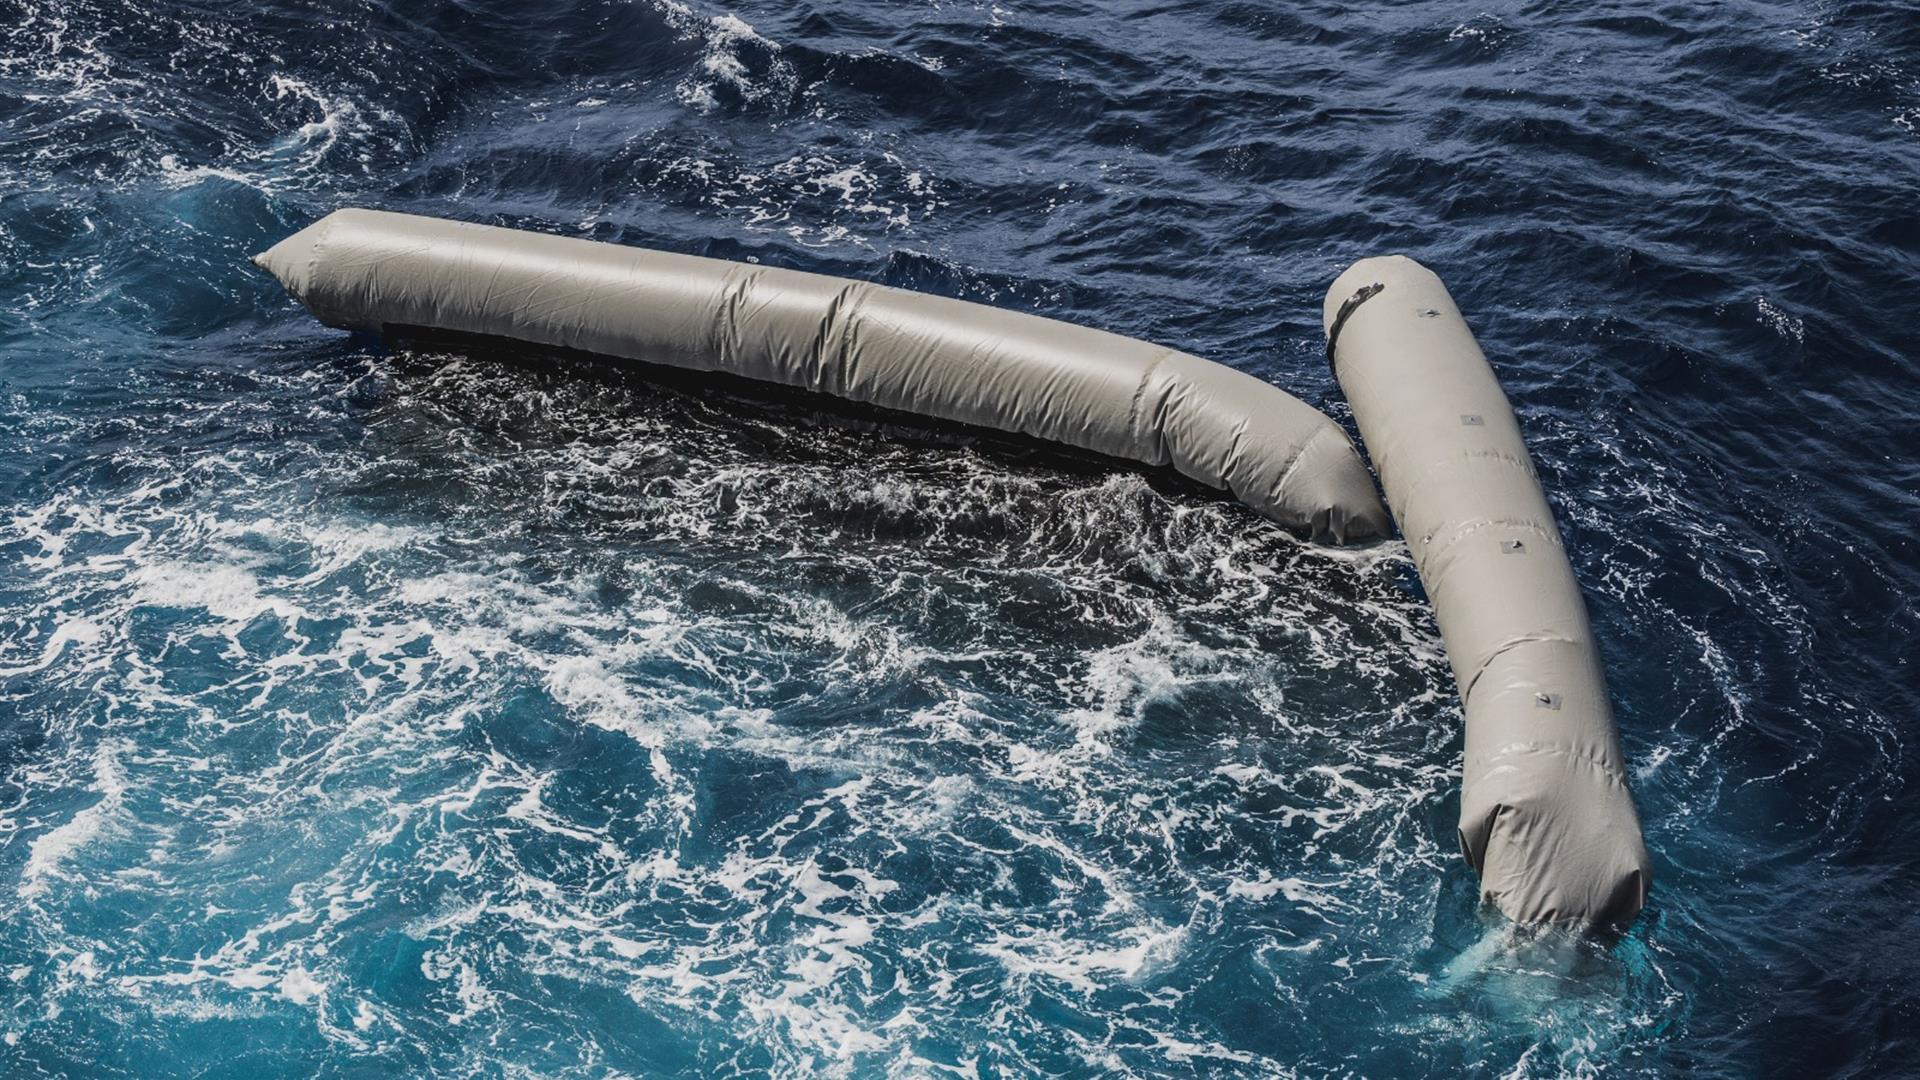 Mediterraneo: annegare nell'indifferenza